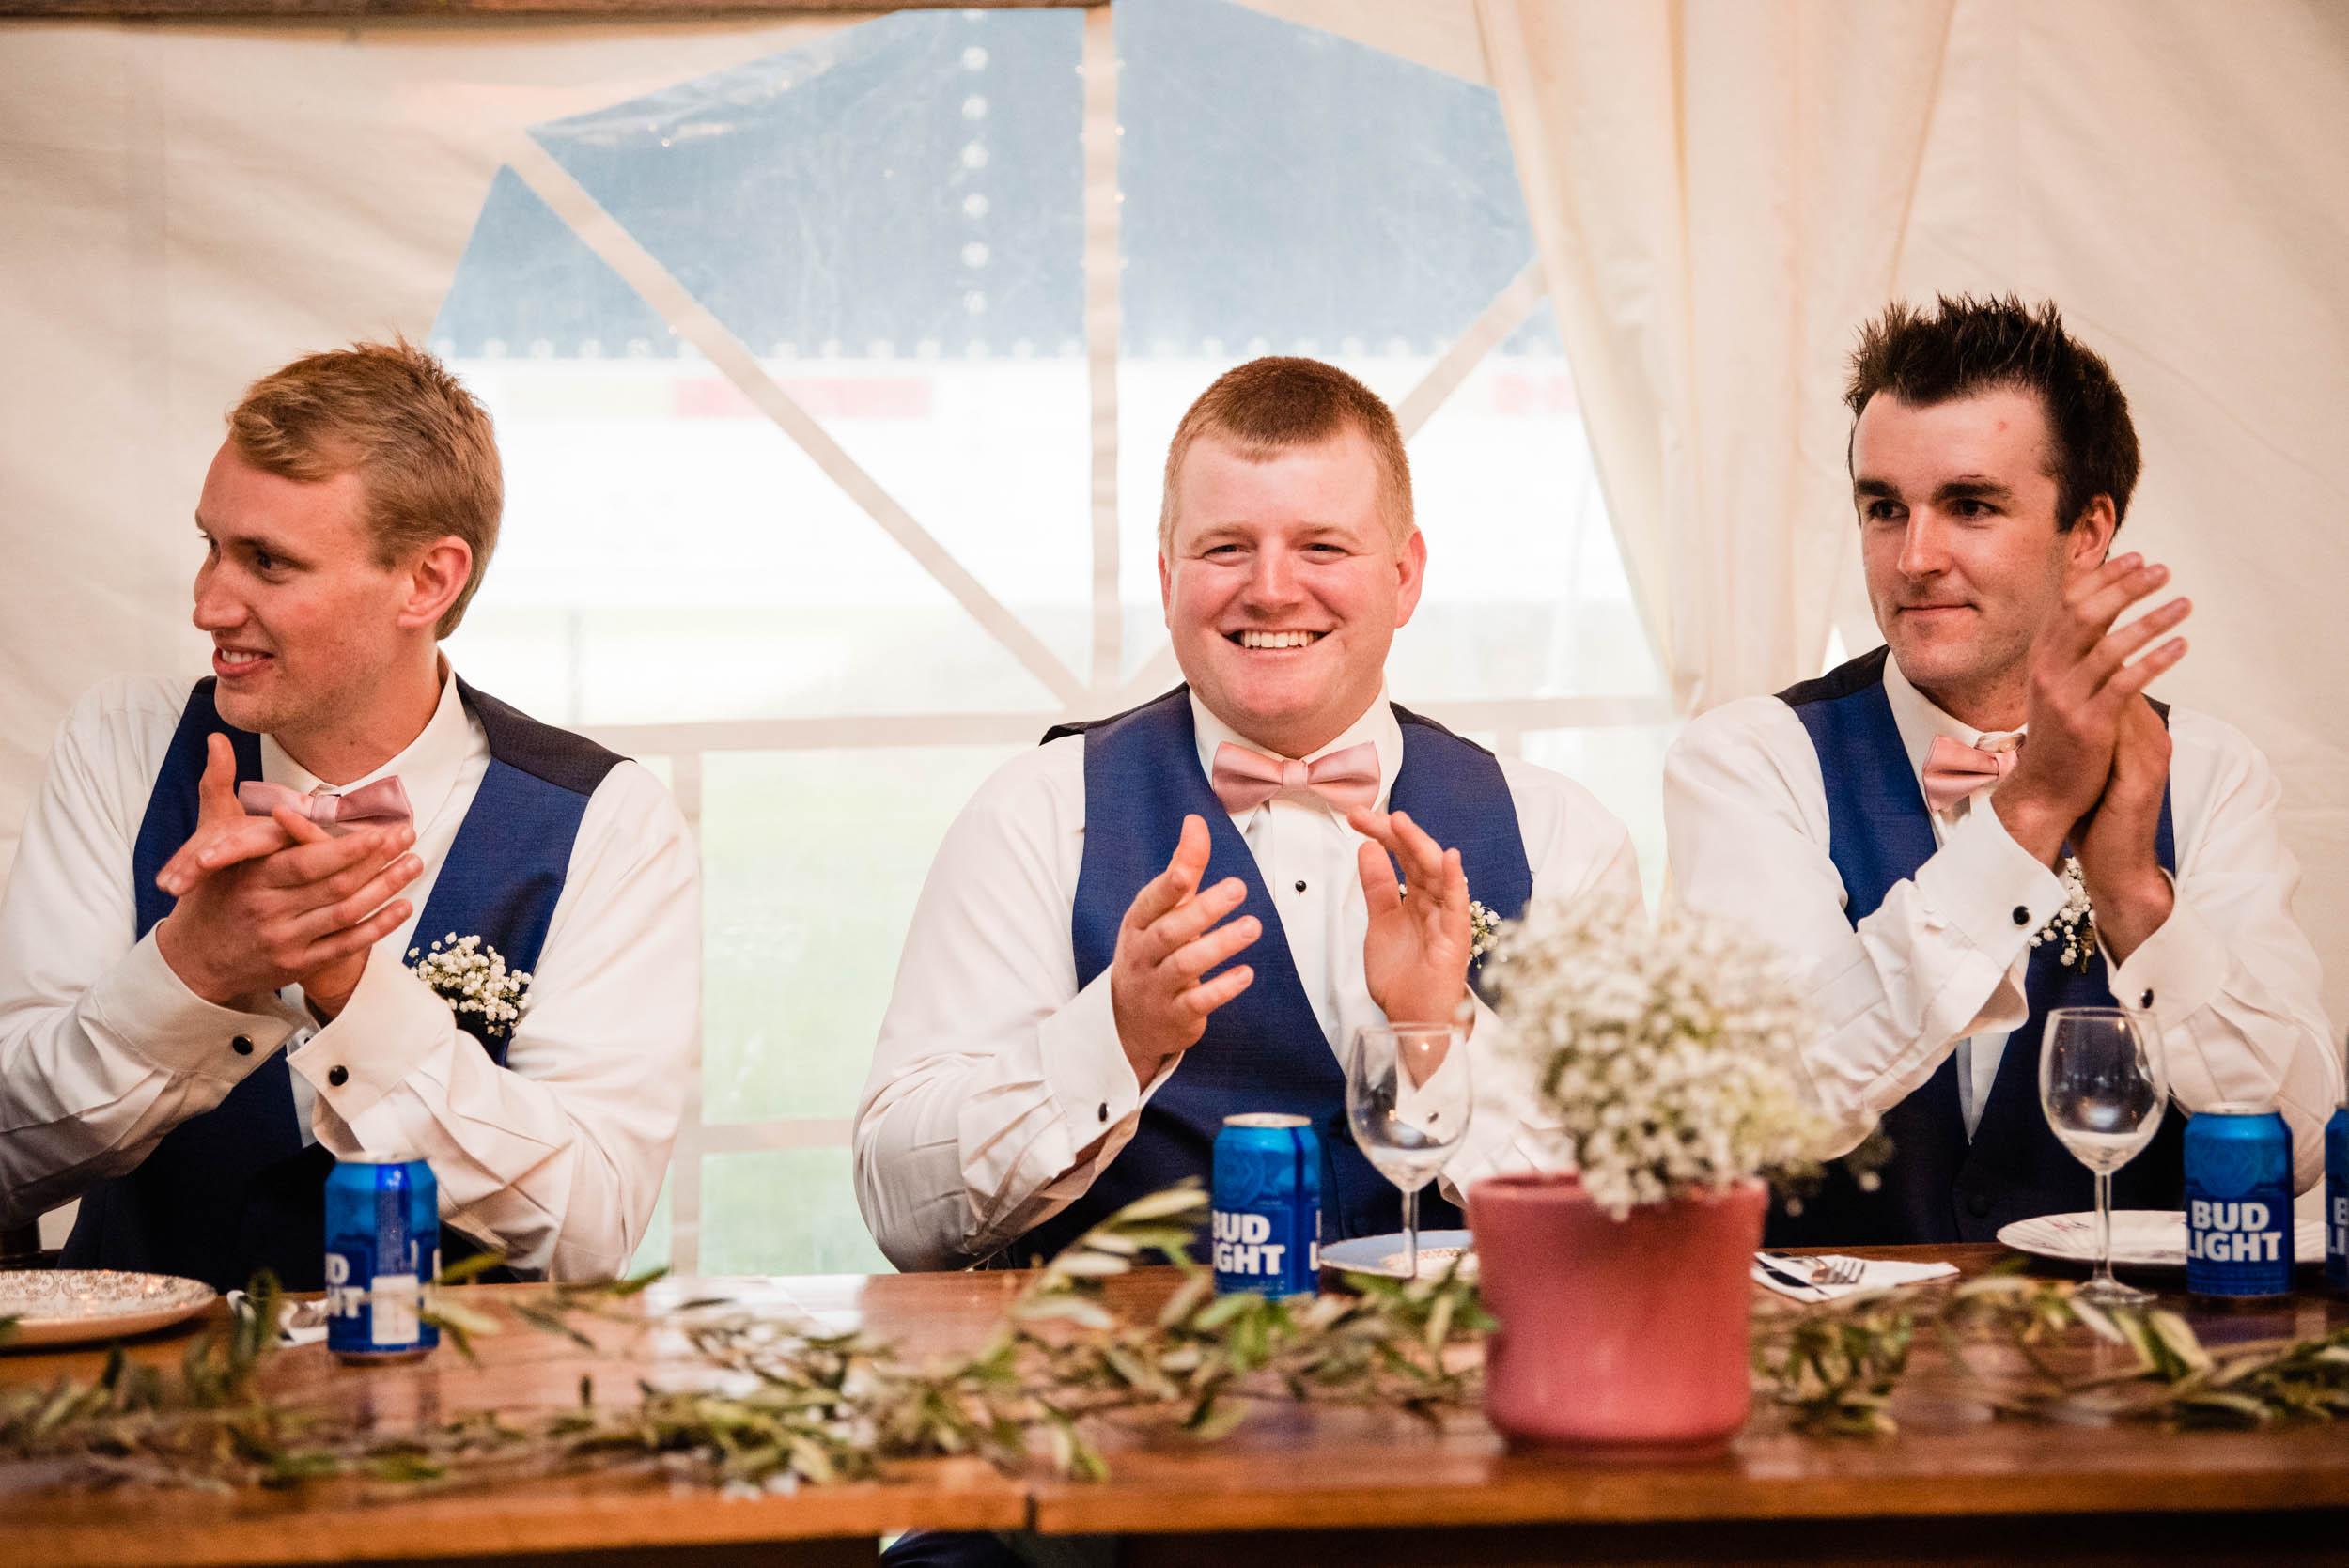 london-ontario-wedding-photography-farm-tent (85).jpg